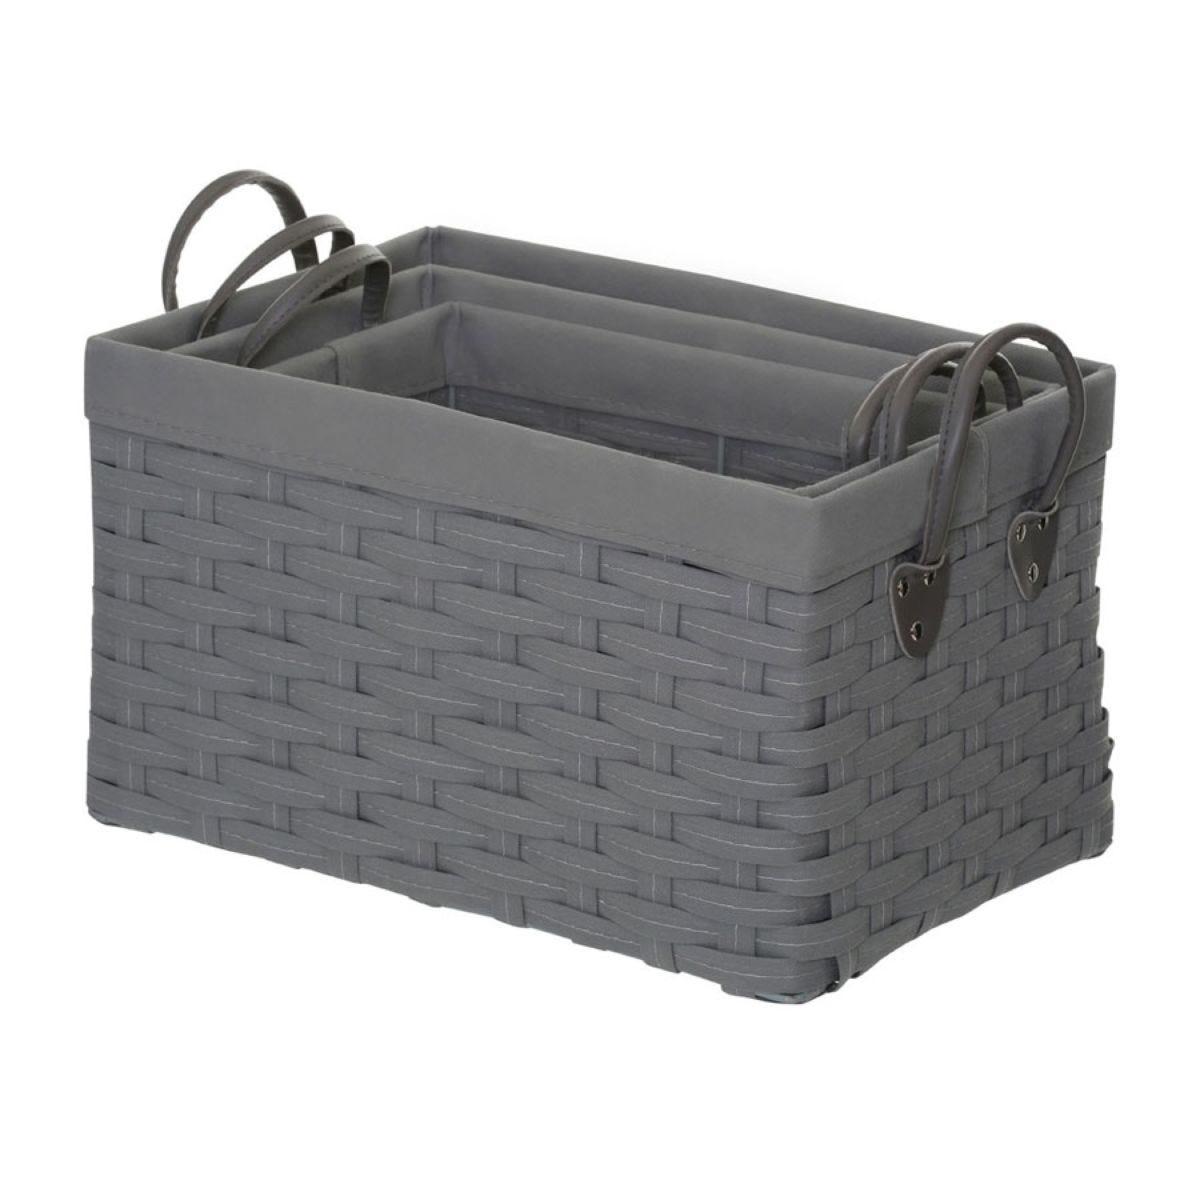 Premier Housewares Lida Nesting Storage Baskets - Grey